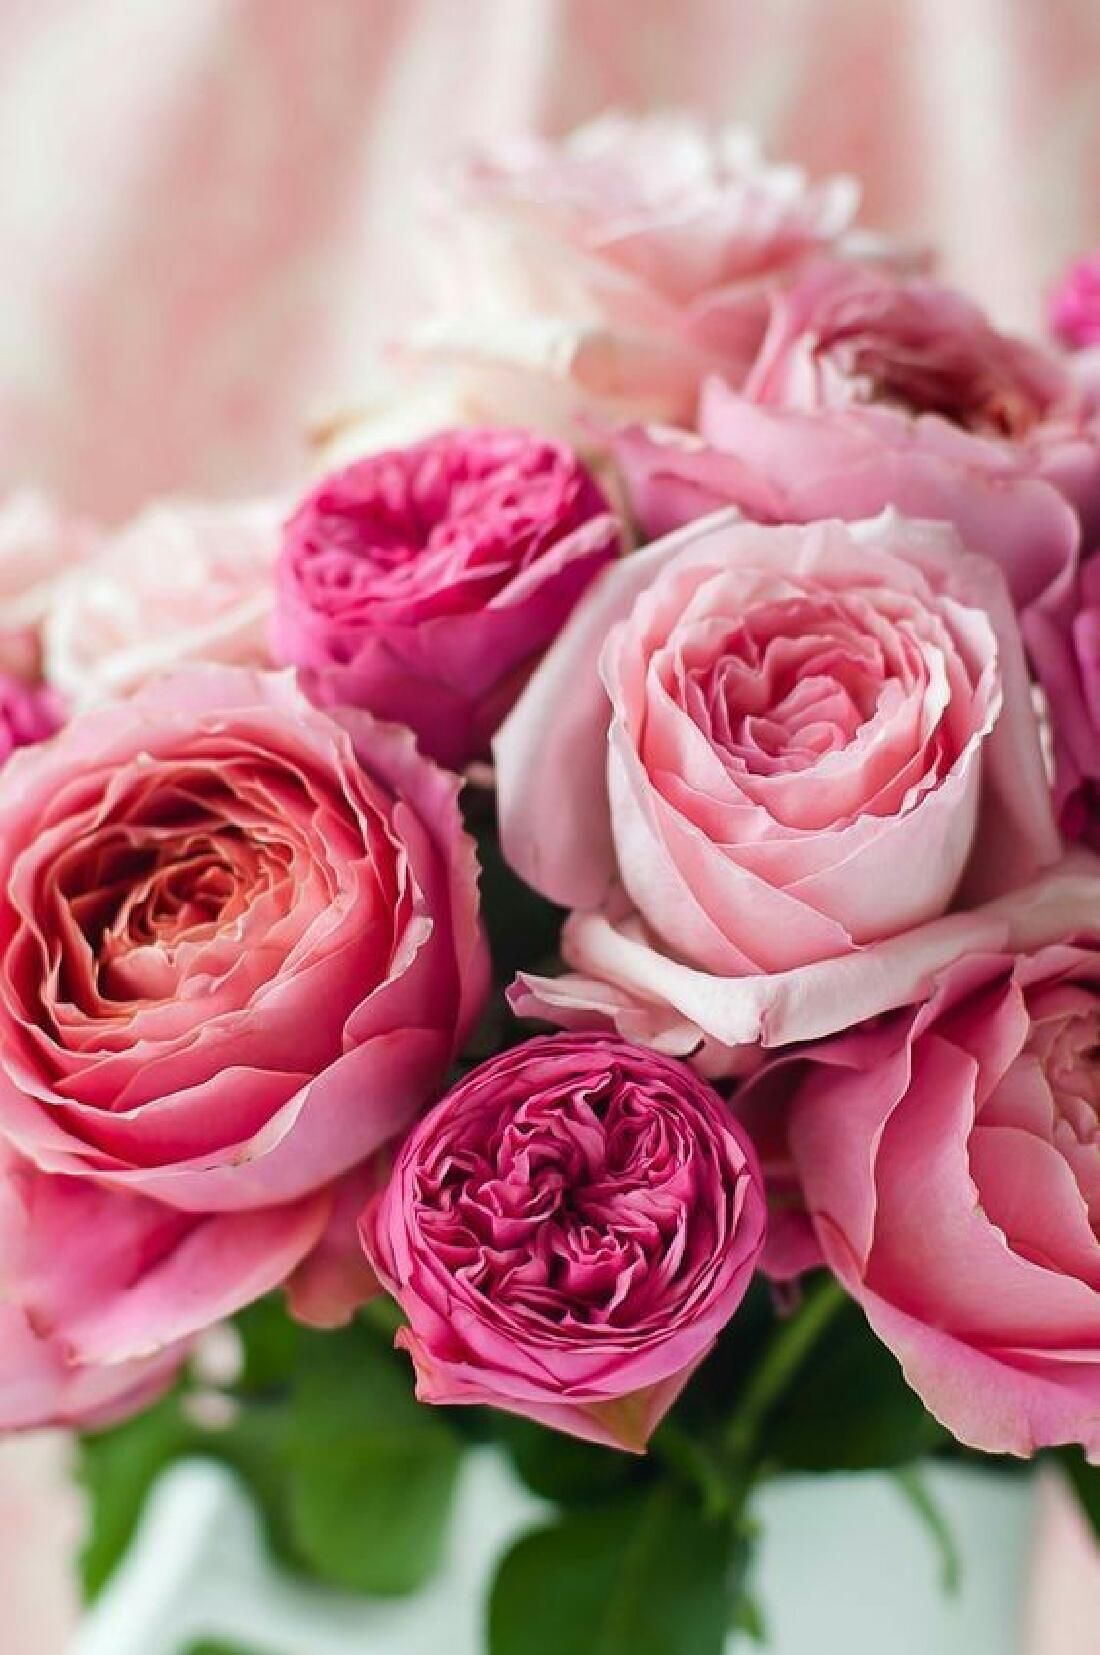 99 pinterest flowers flower power 99 izmirmasajfo